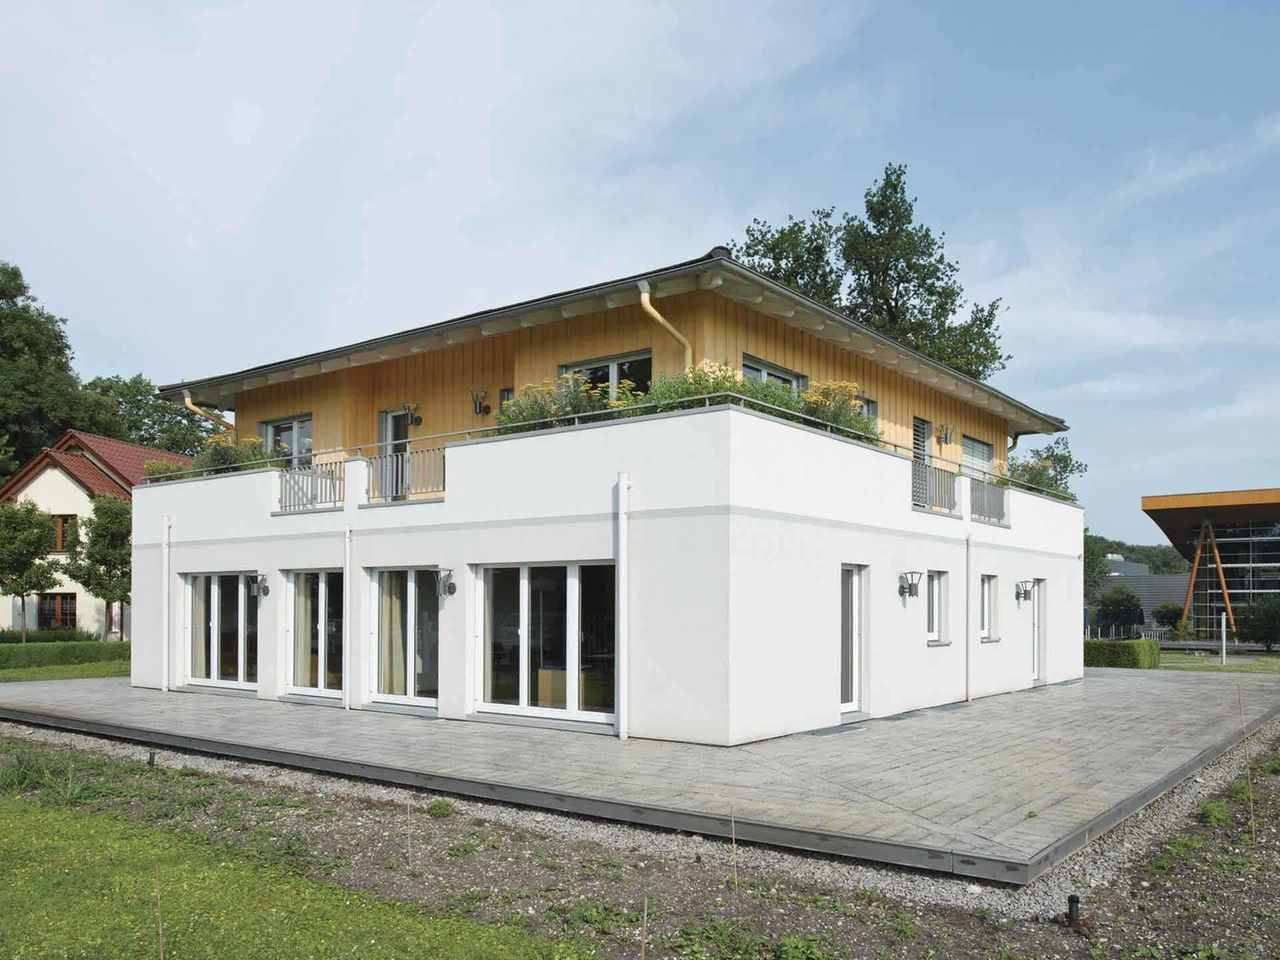 Stadtvilla Bauforum Rheinau-Linx - WeberHaus